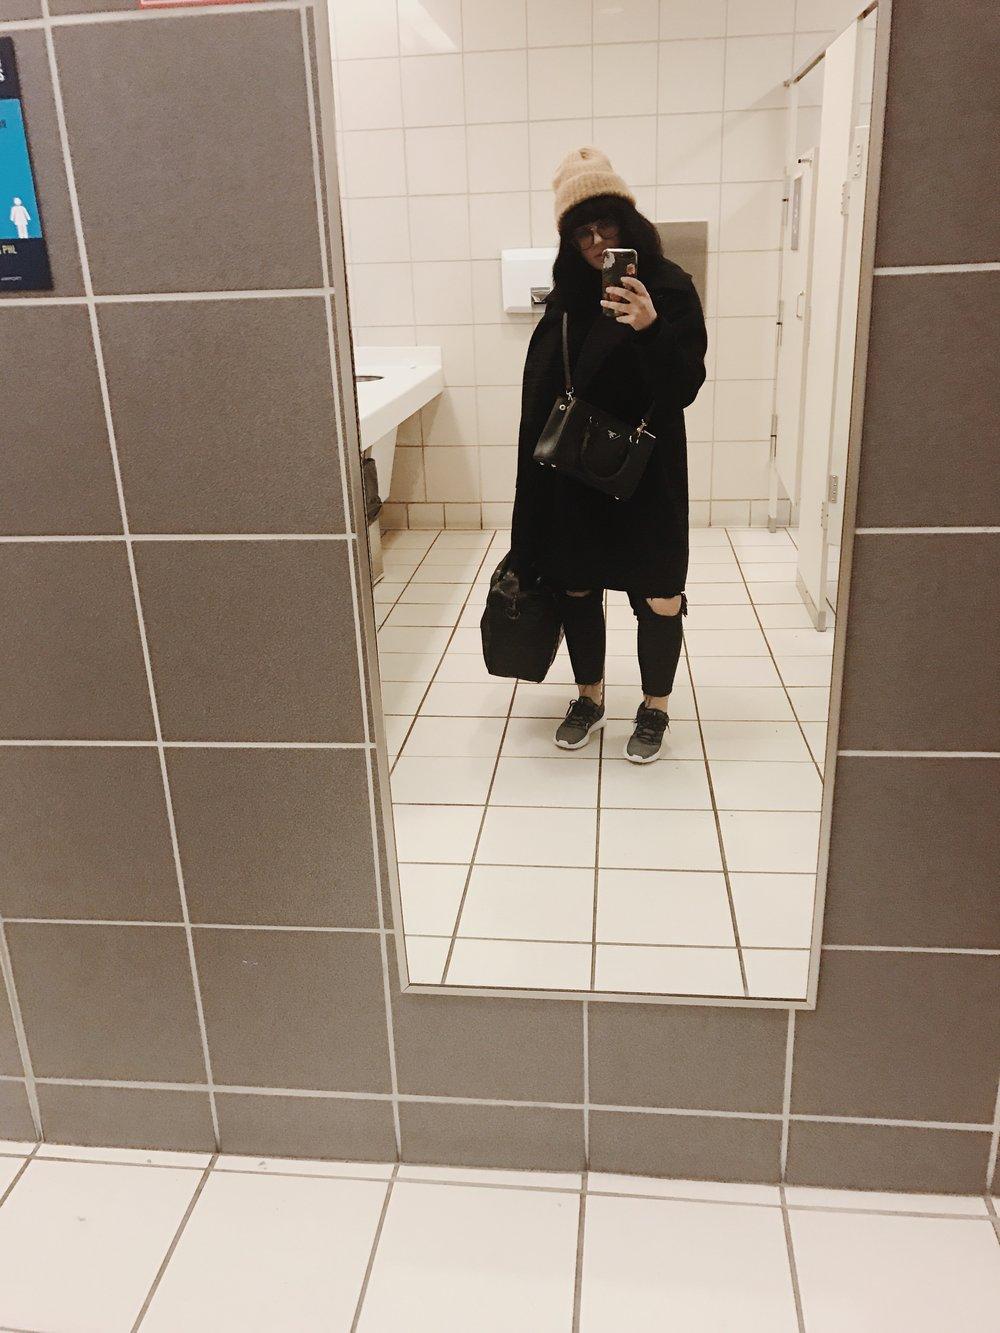 solo-travel-airport-dress.jpg